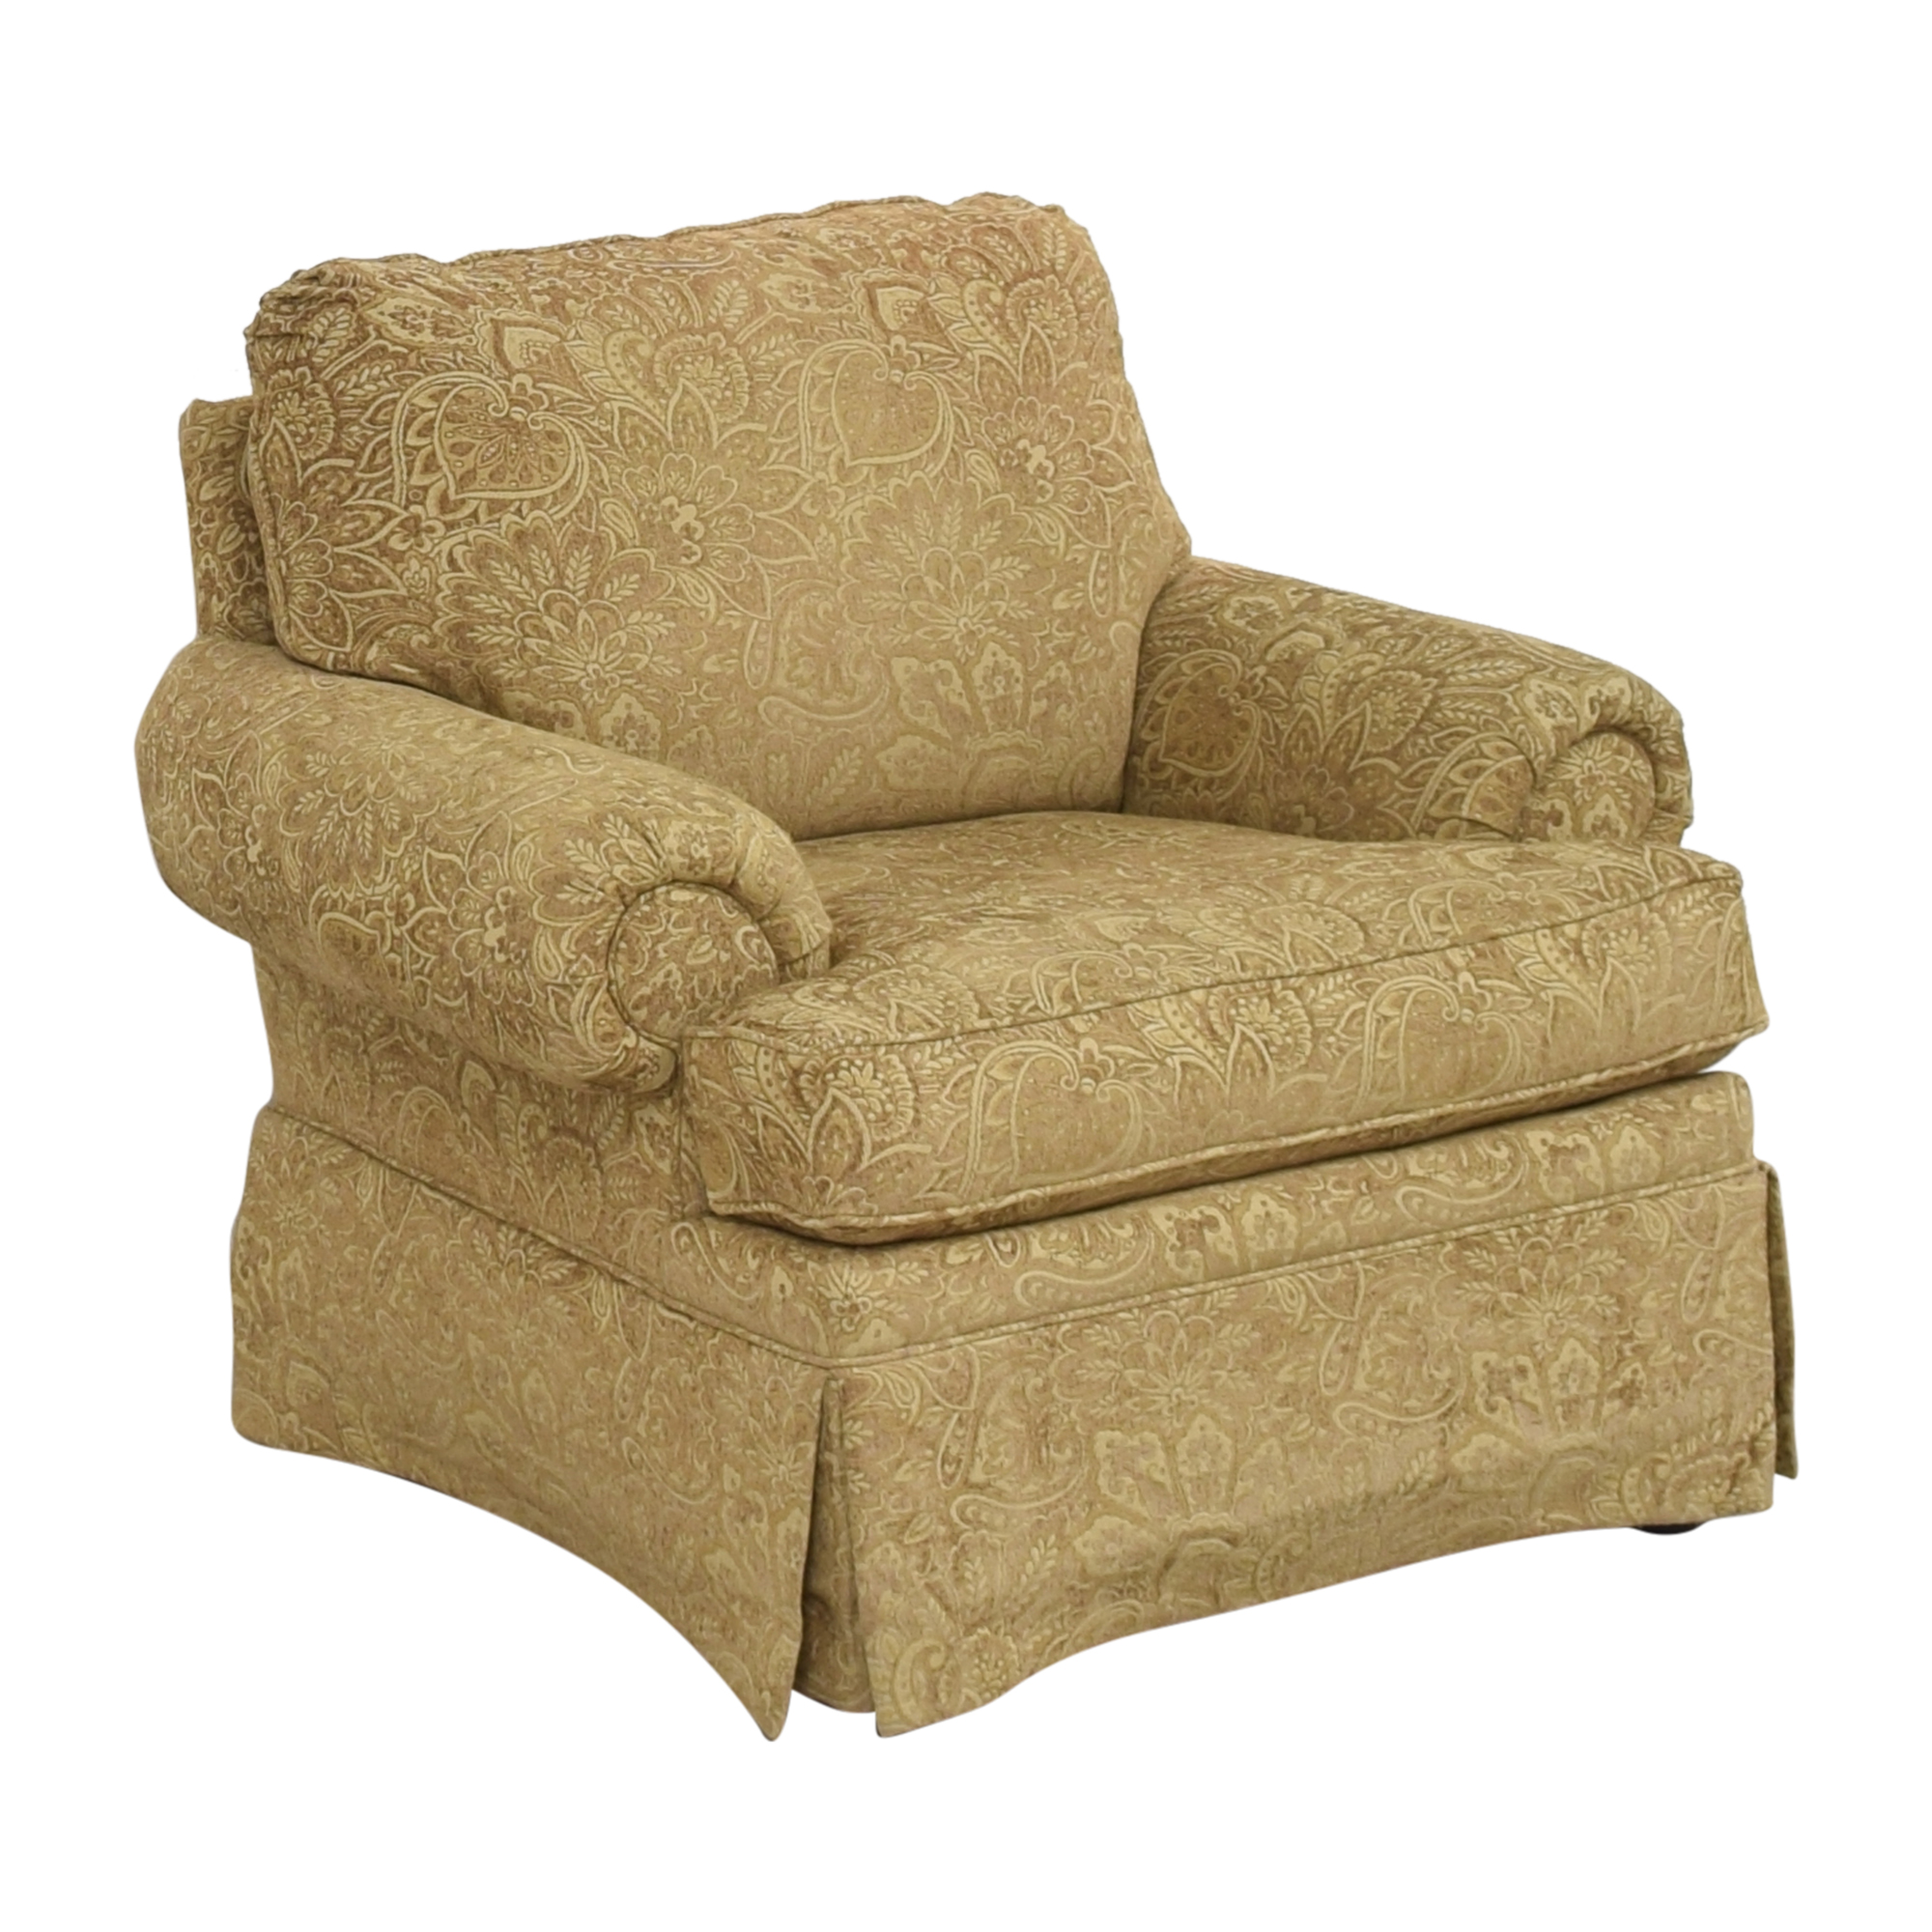 Clayton Marcus Clayton Marcus Lauren Roll Arm Chair used